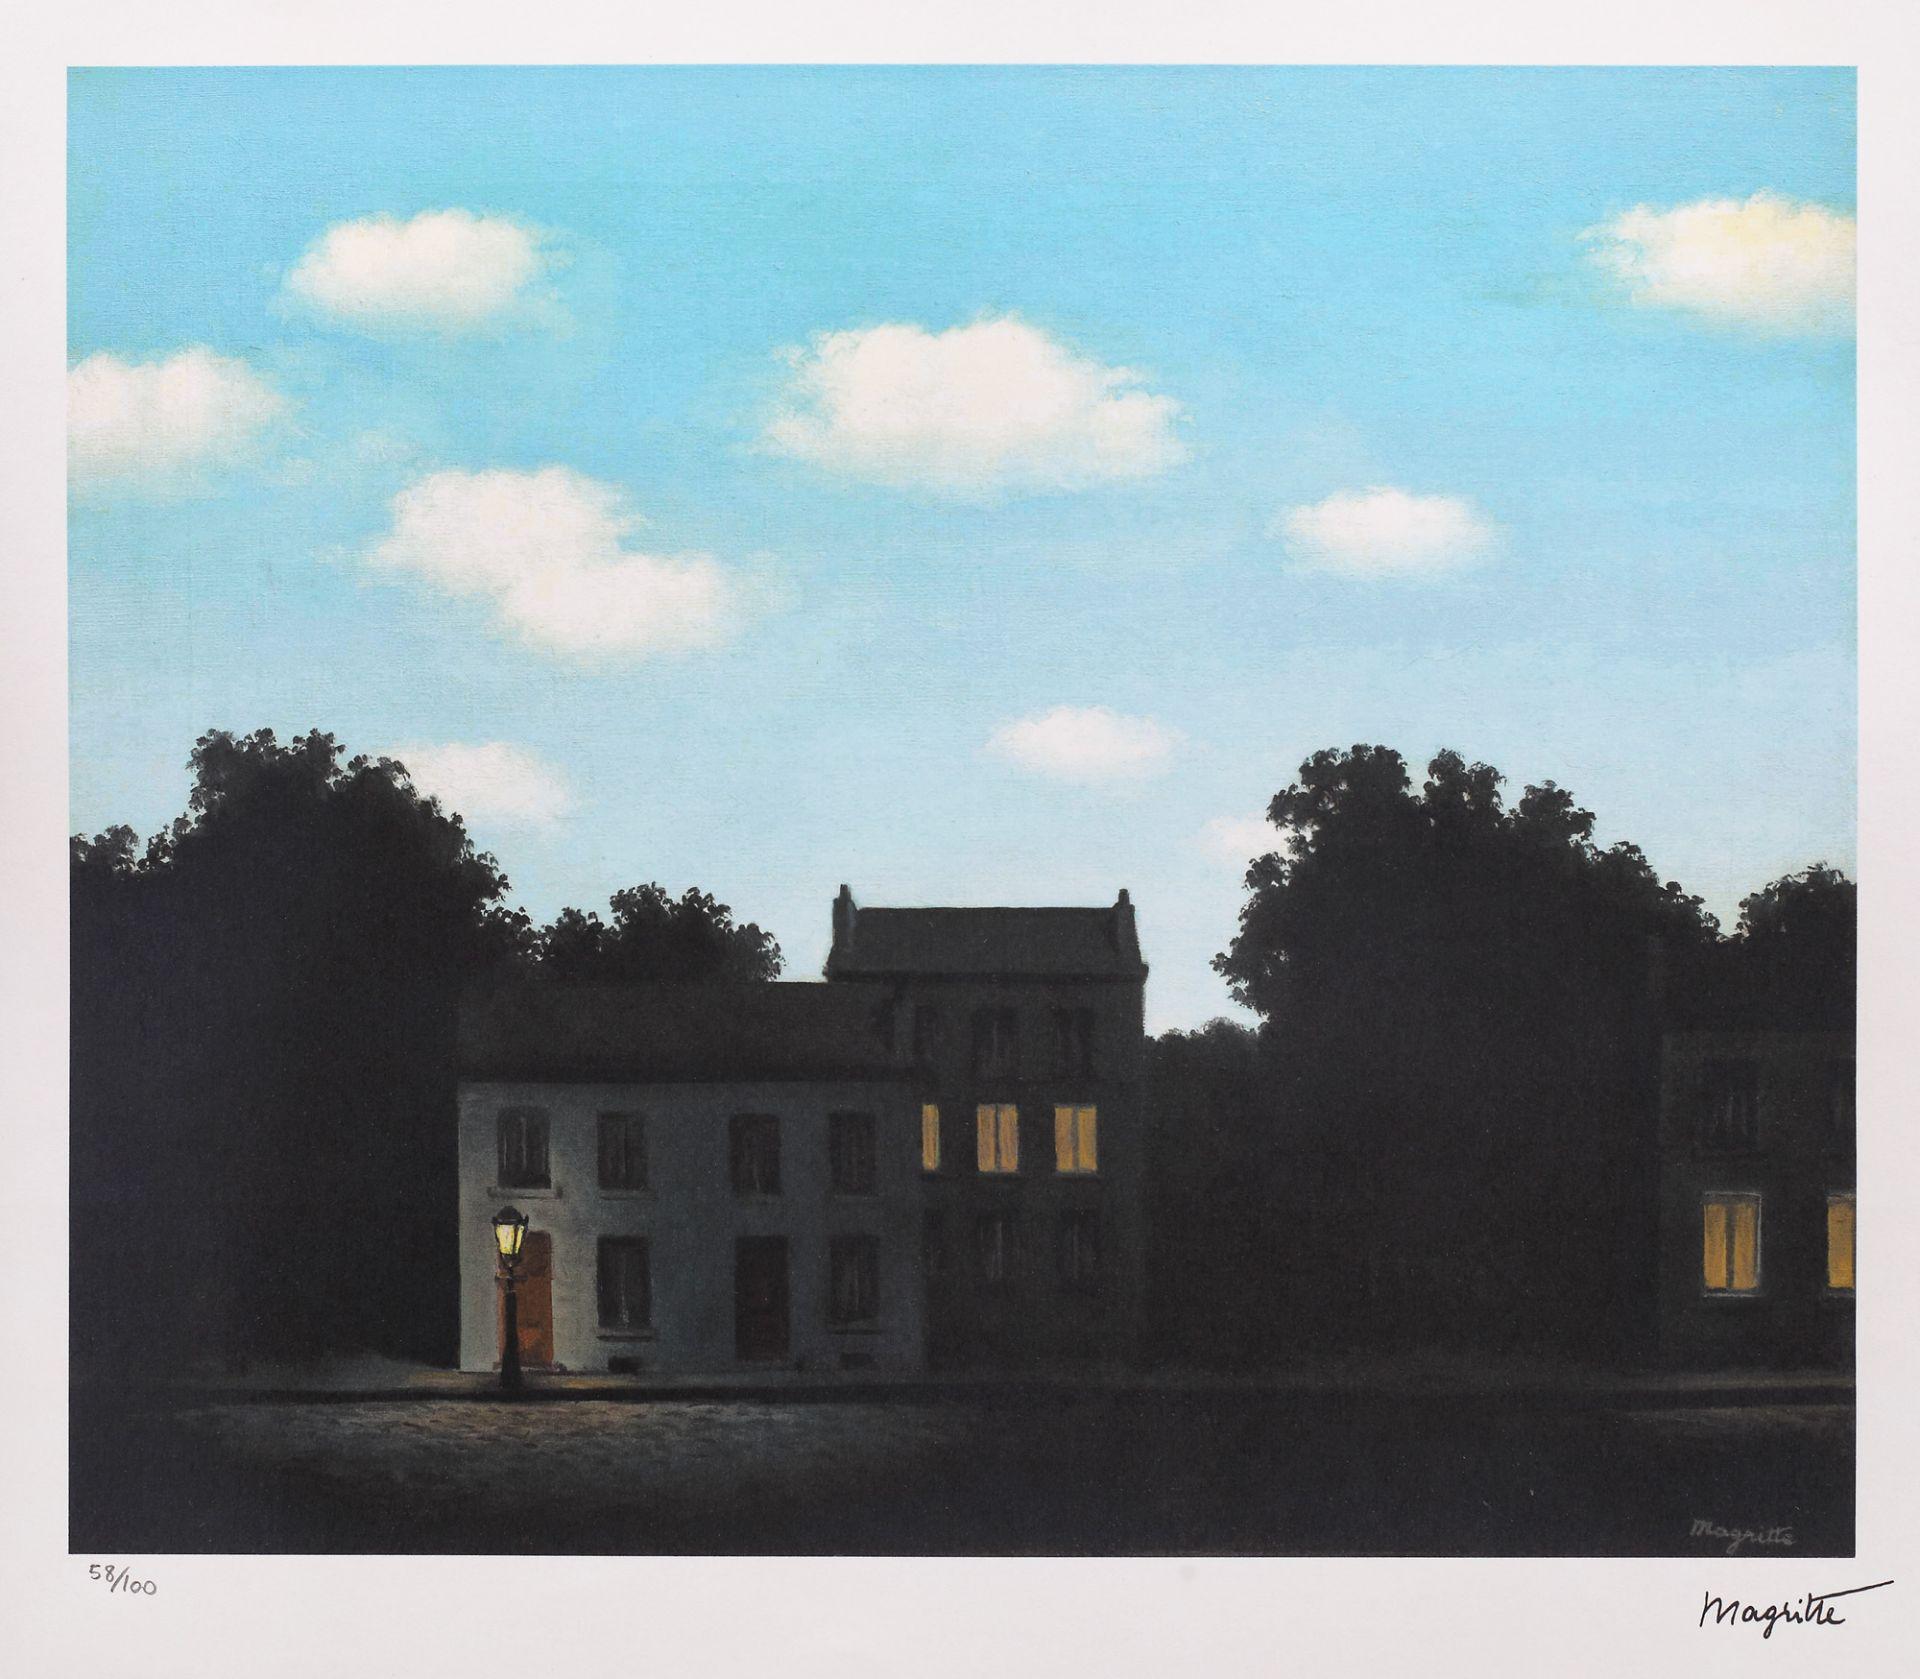 René Magritte, The Empire of Light René Magritte, The Empire of Light, chromolithography, 35 × 42,5